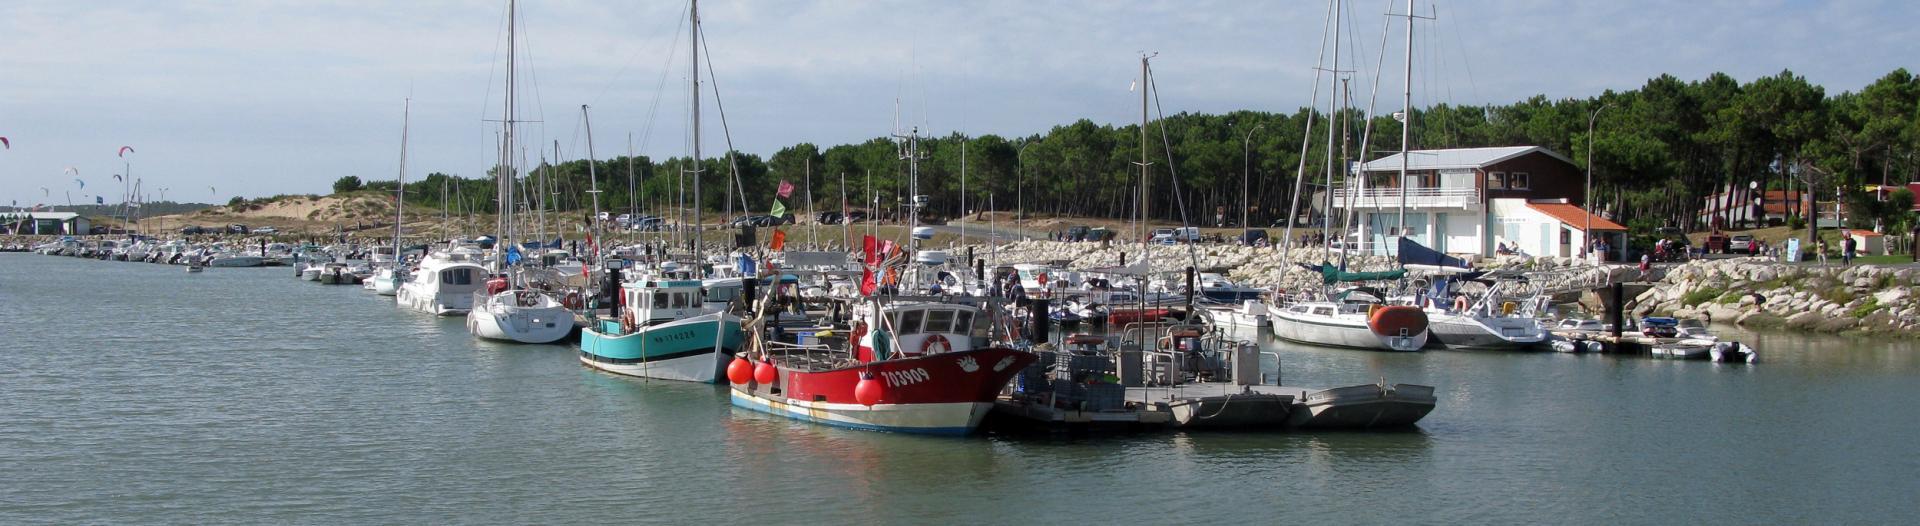 Charente-Maritime port bord de mer